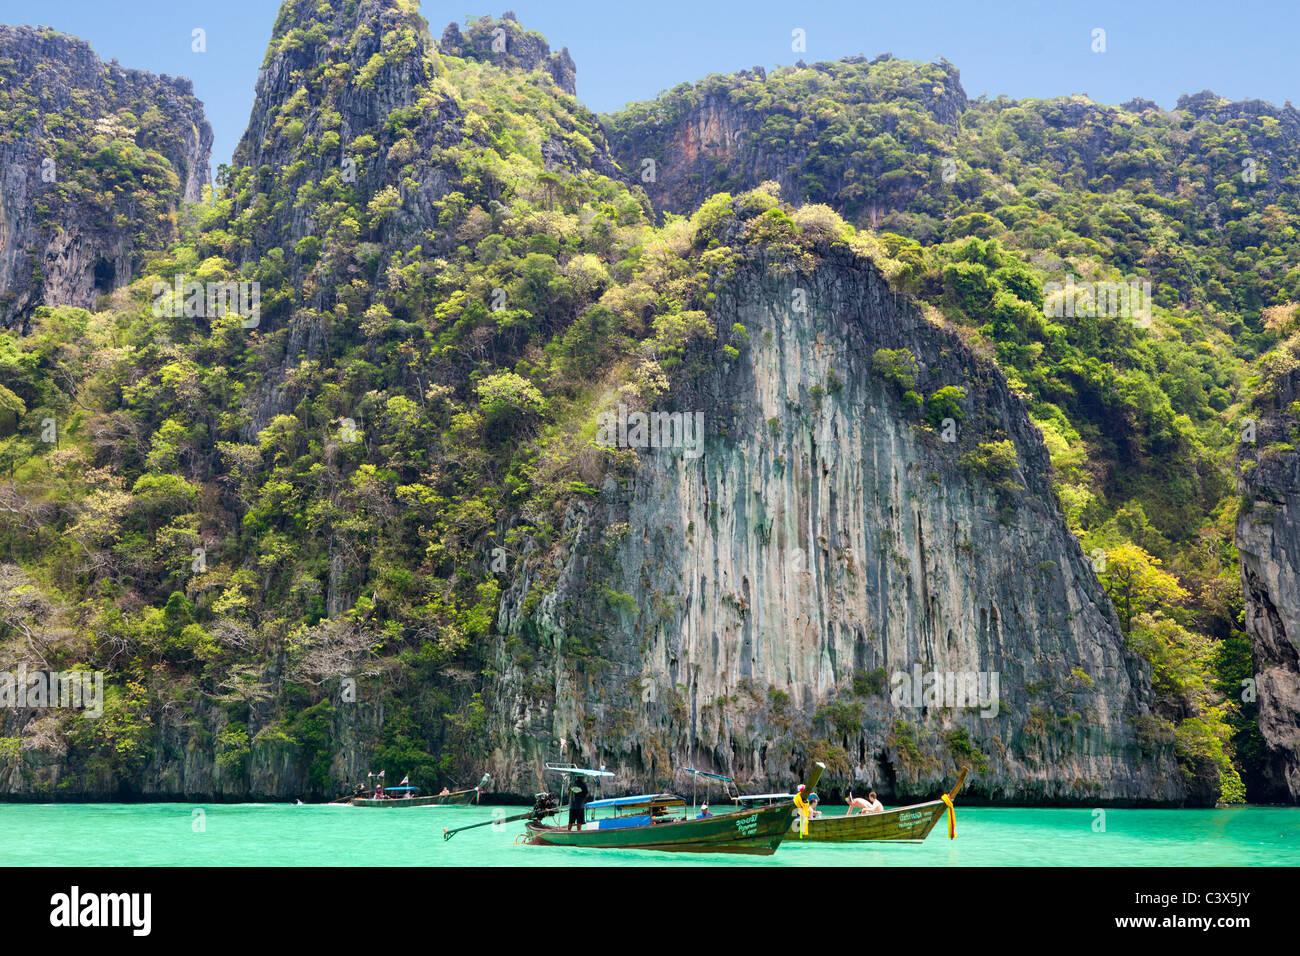 Tourist boats cruising Phang Nga Bay, Phuket Thailand - Stock Image